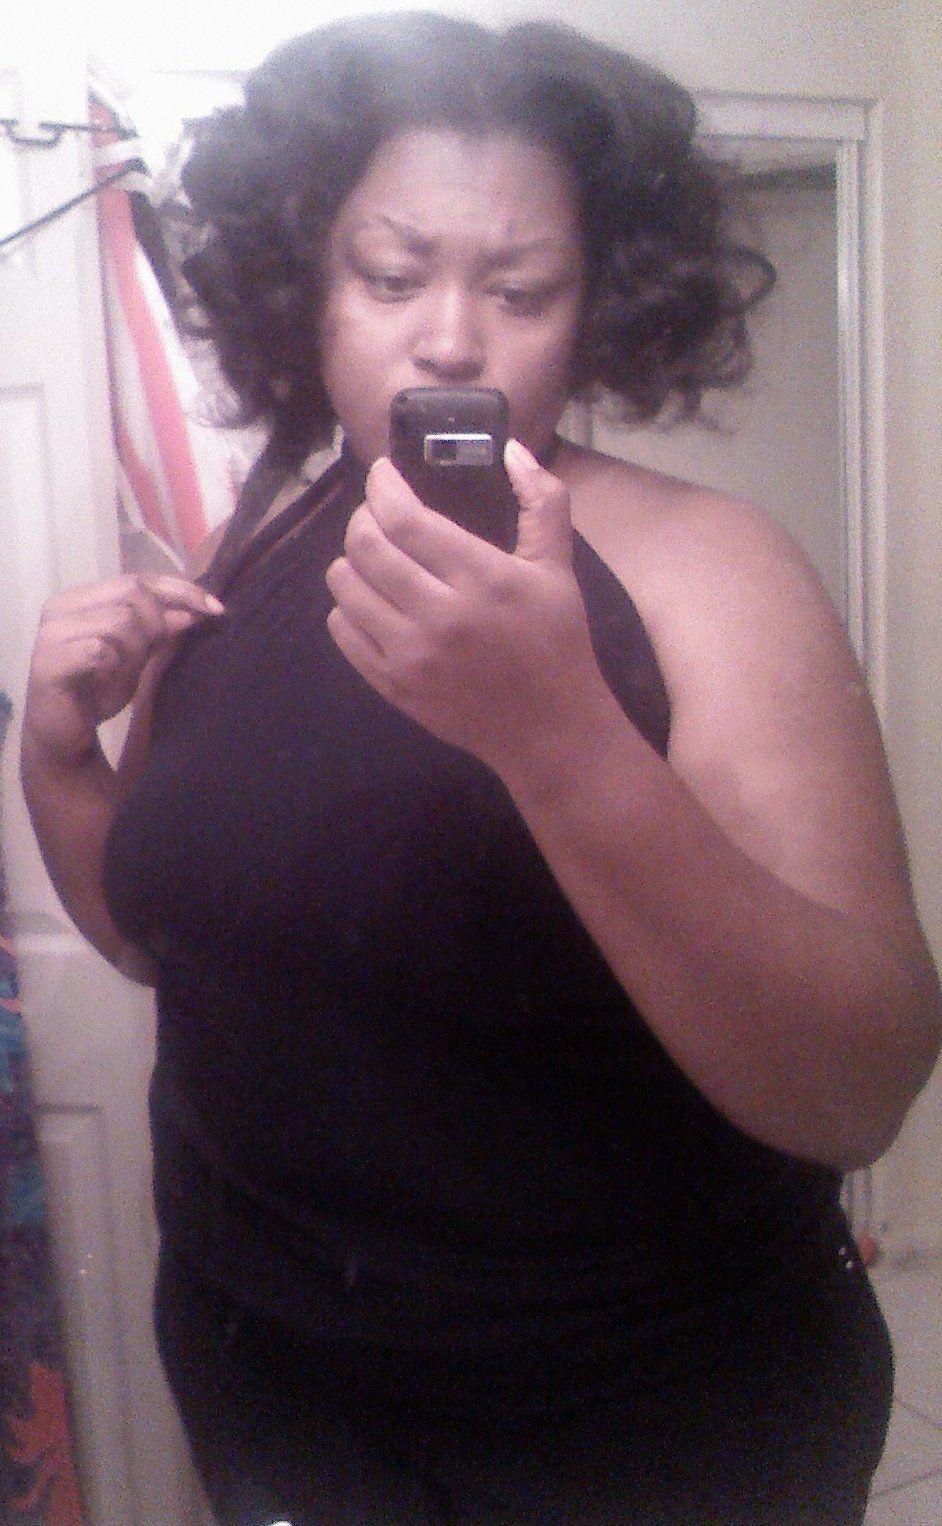 Black girl thumbs